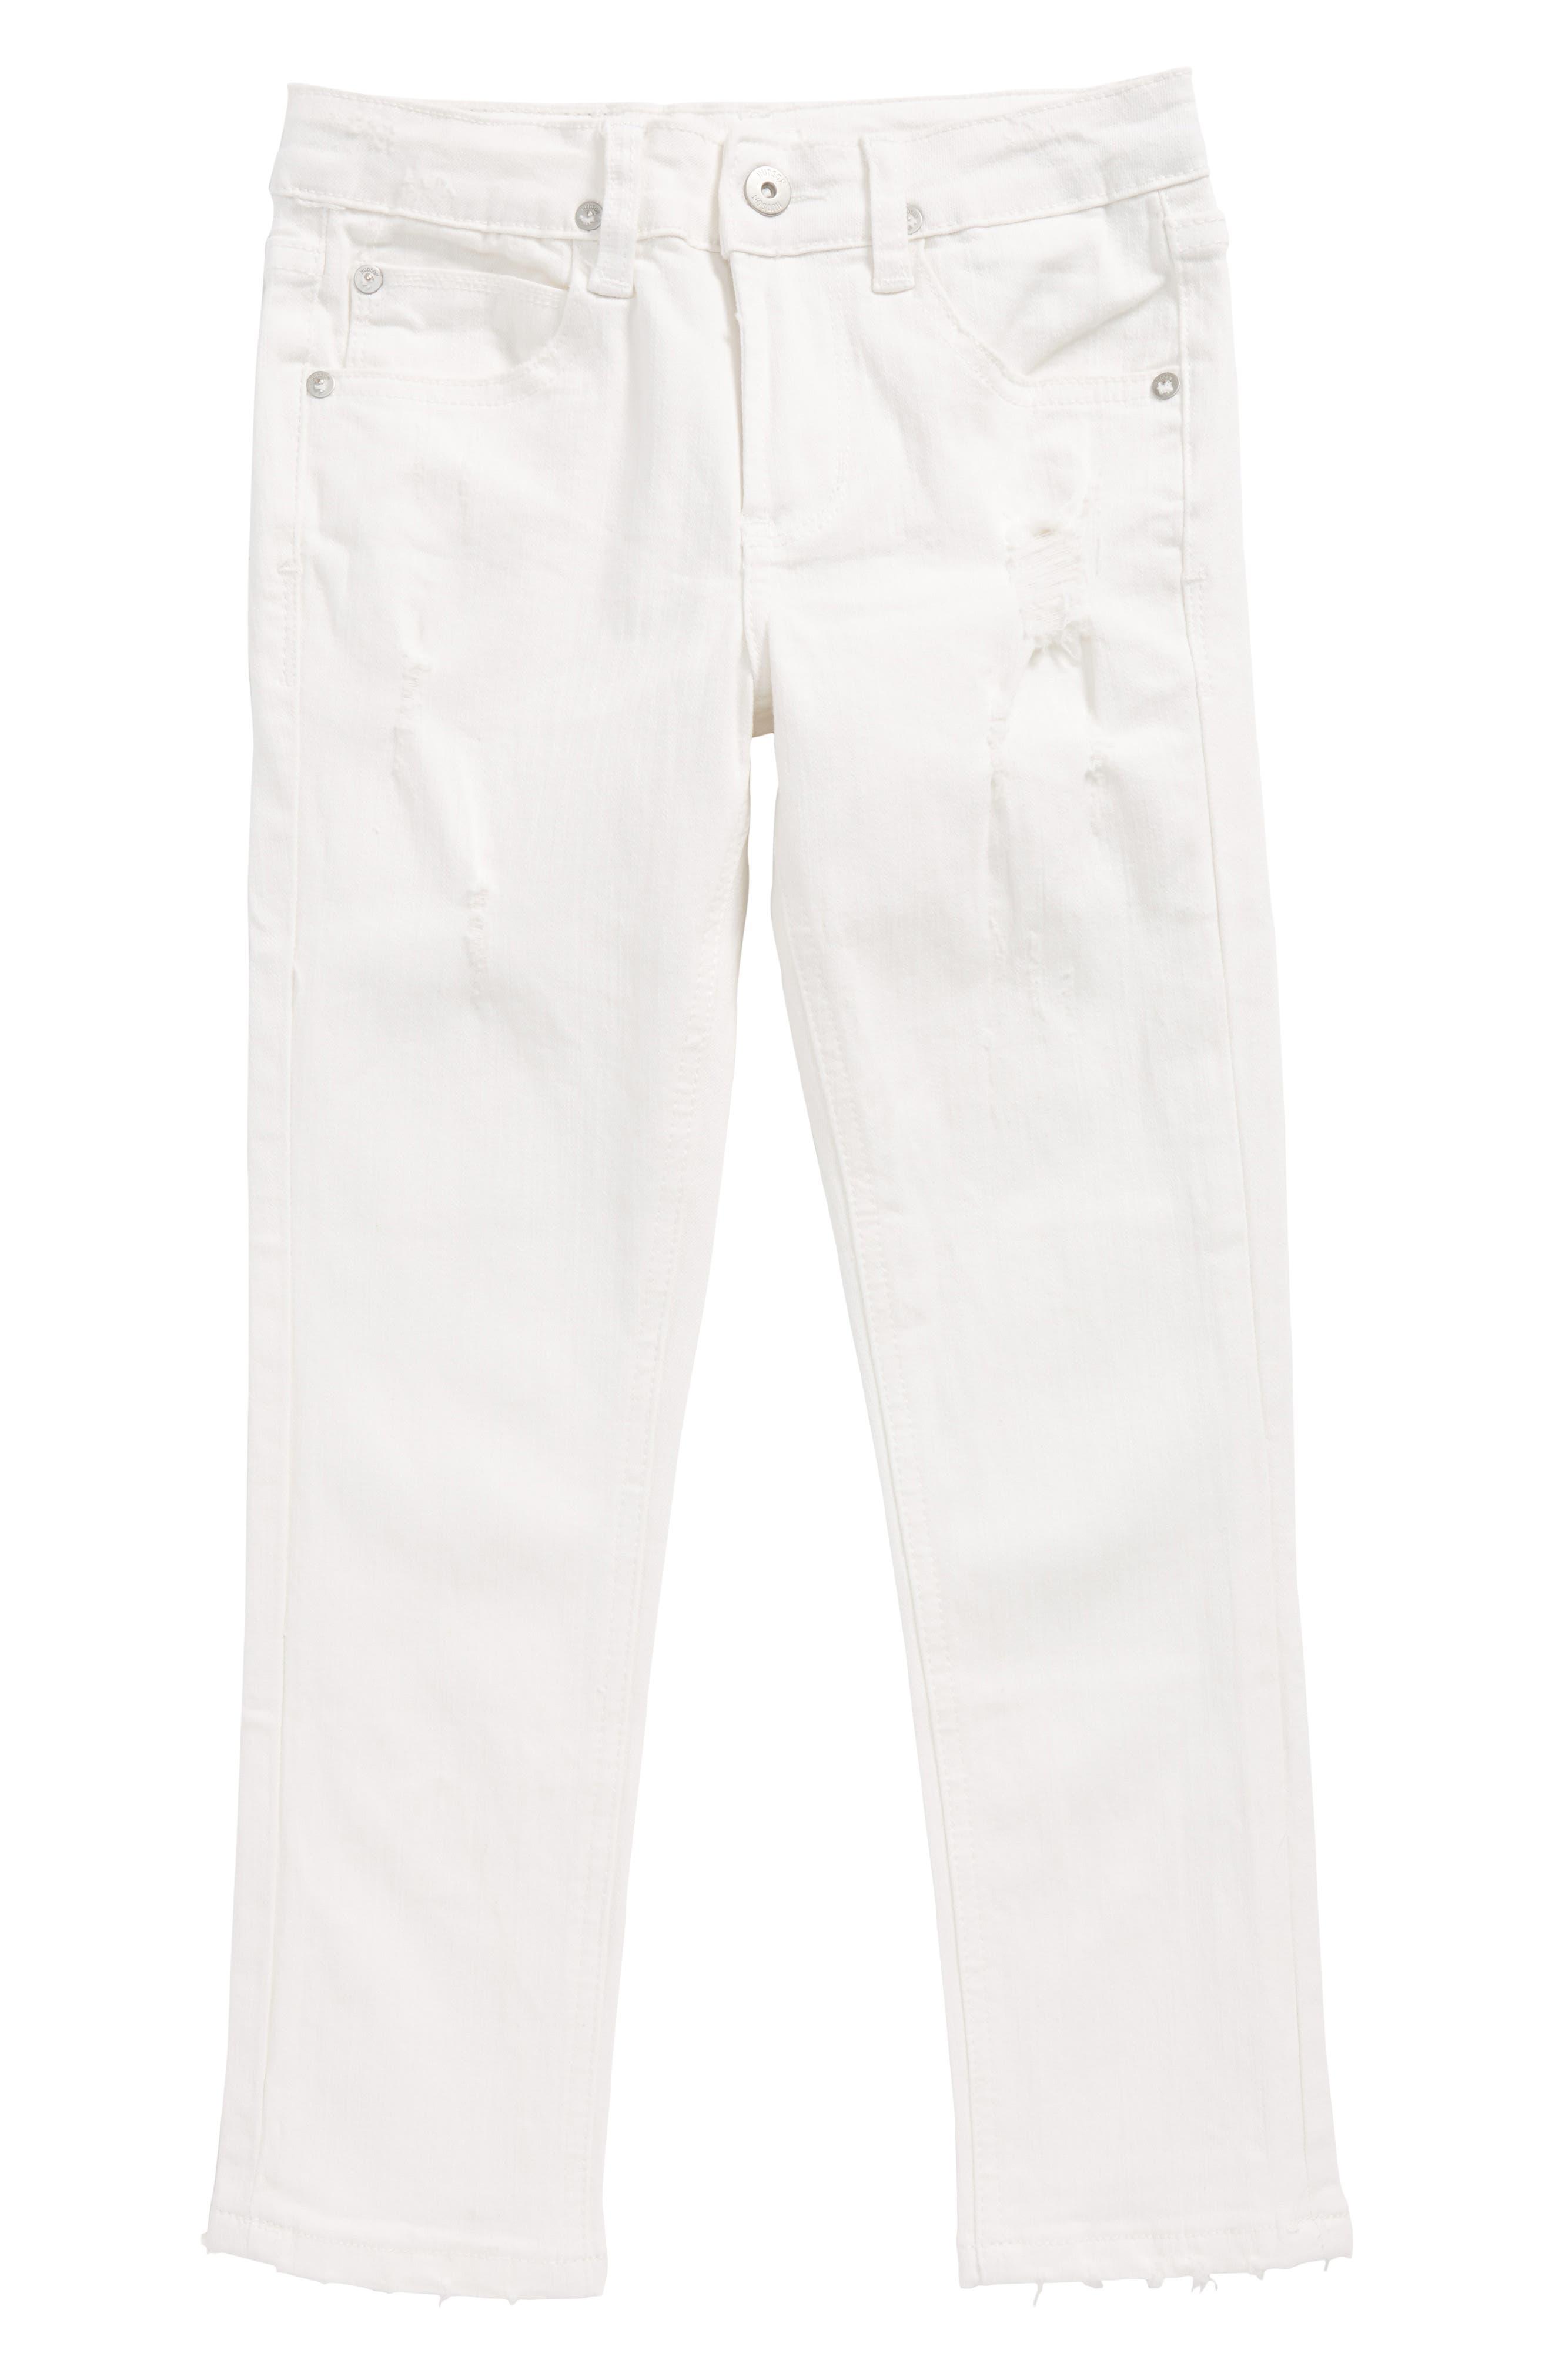 Jagger Slim Straight Leg Jeans,                             Main thumbnail 1, color,                             116